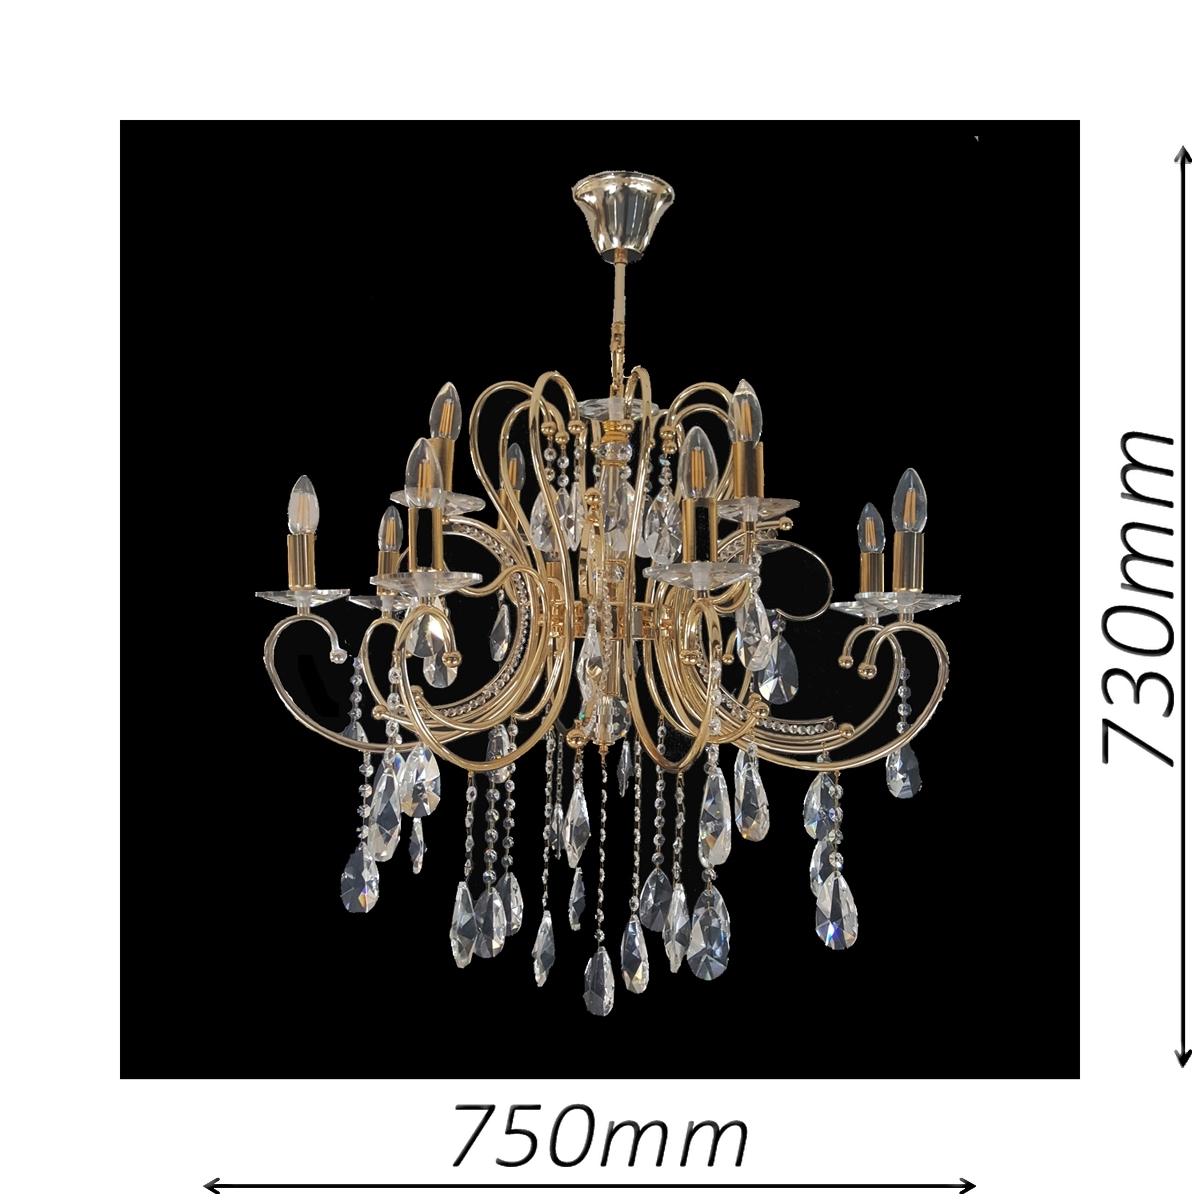 Buckingham 750 Gold Chandelier - CRPBUC12750GD